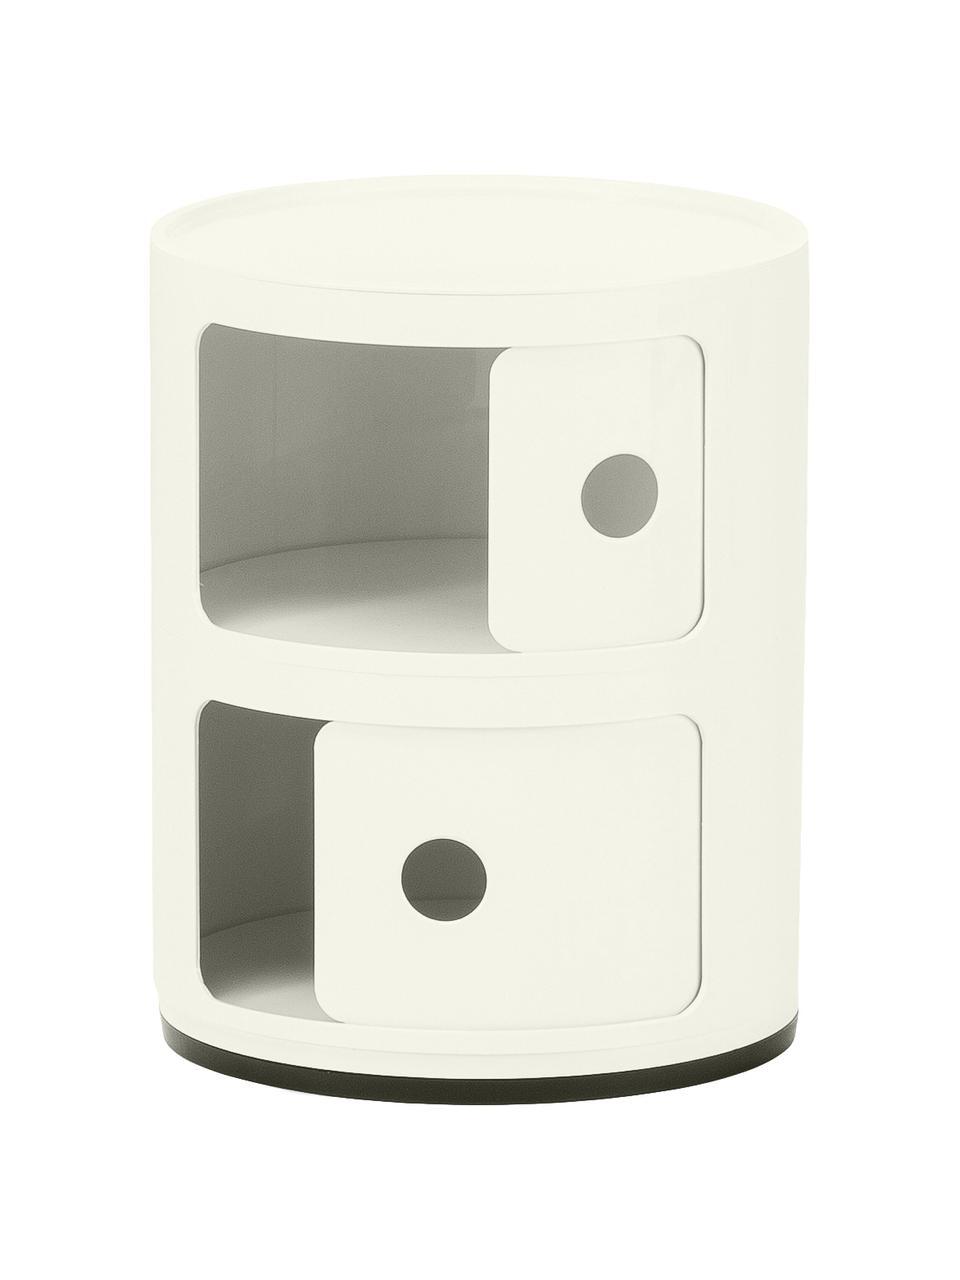 Table d'appoint design 3 compartiments Componibili, Blanc